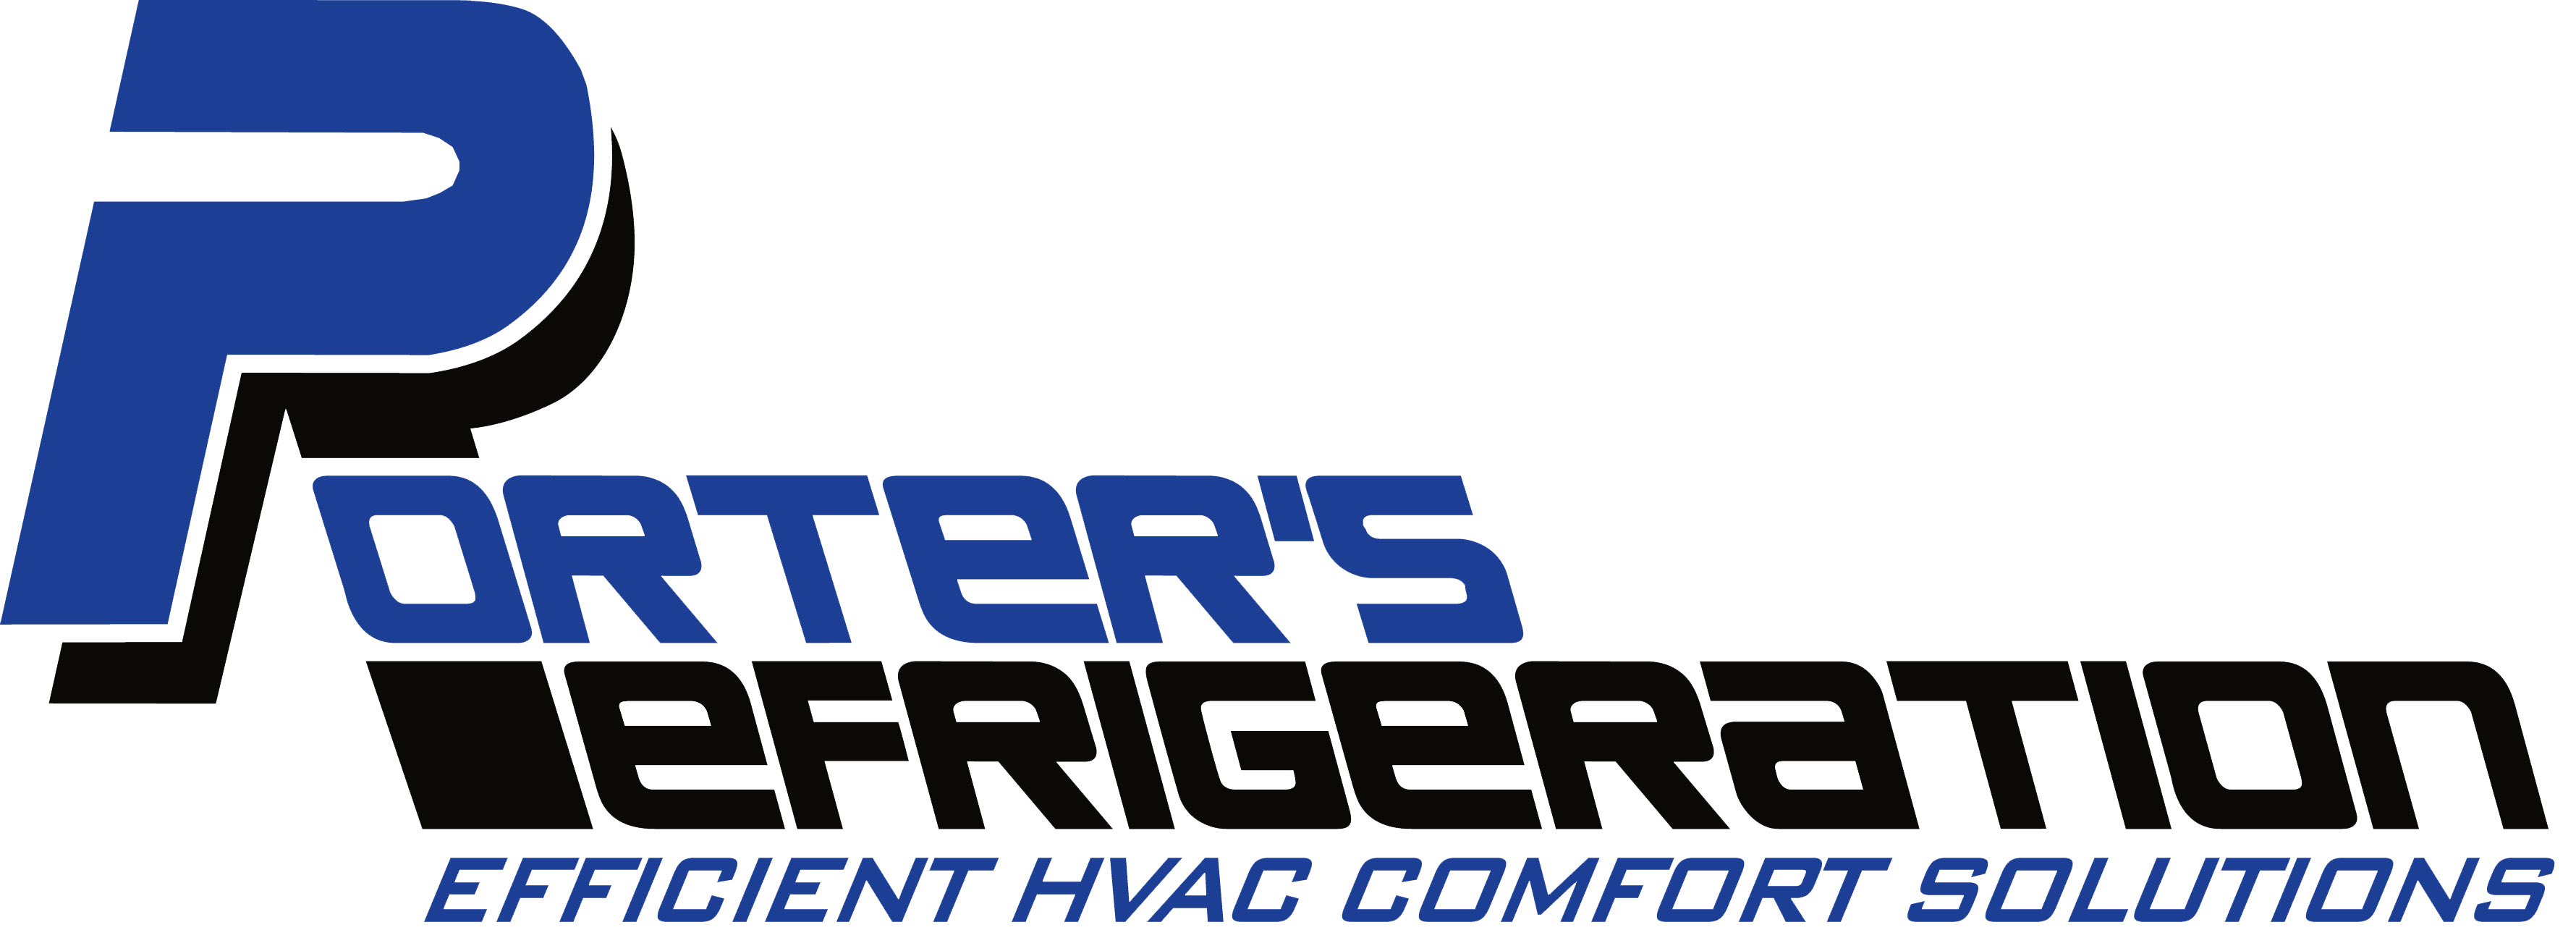 Porter's Refrigeration